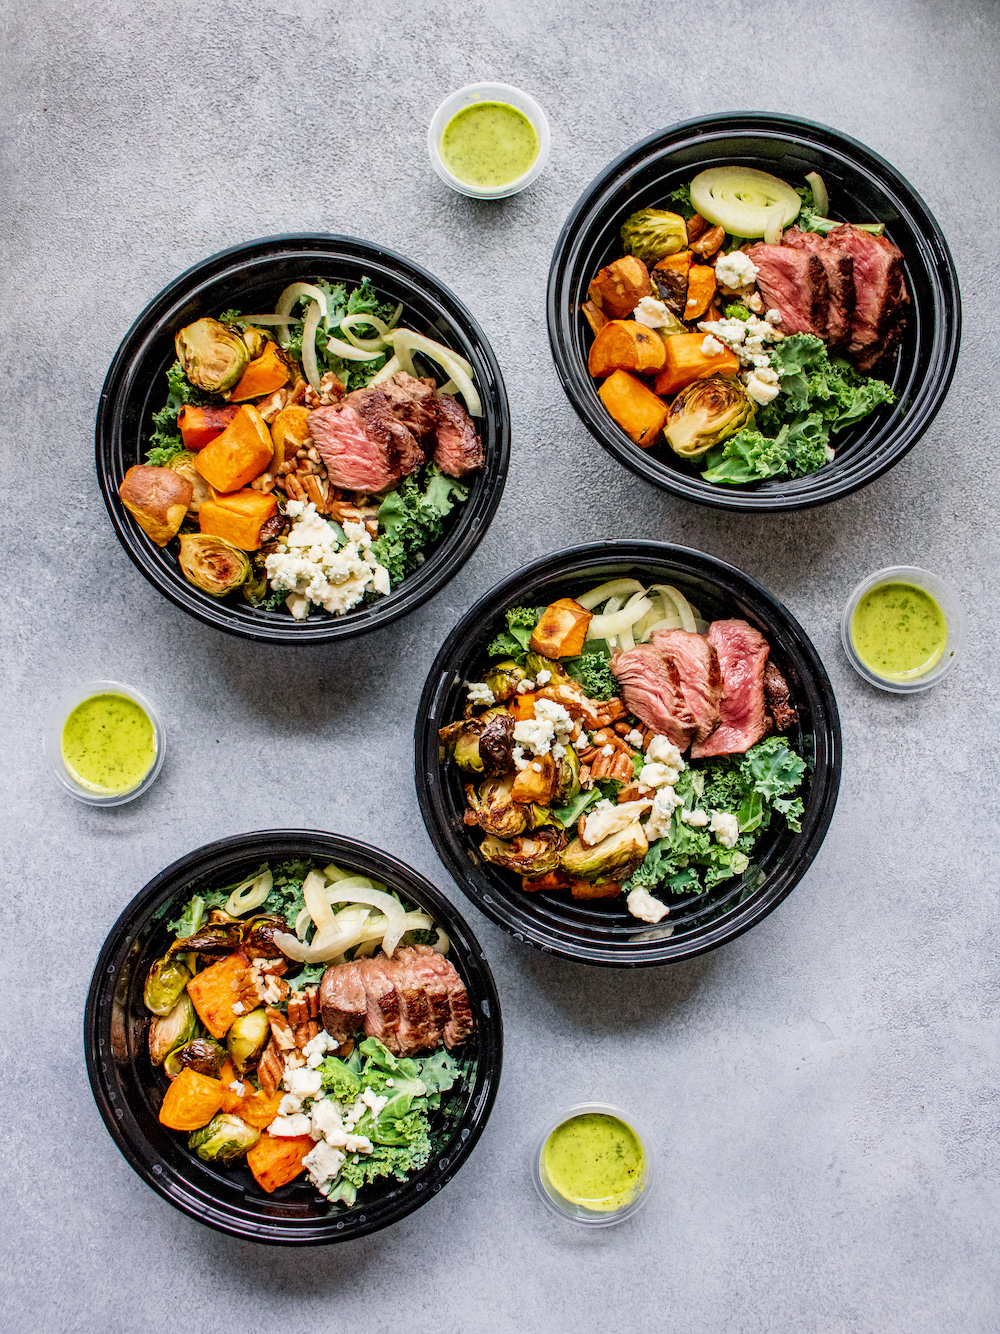 Kale Steak Power Salad